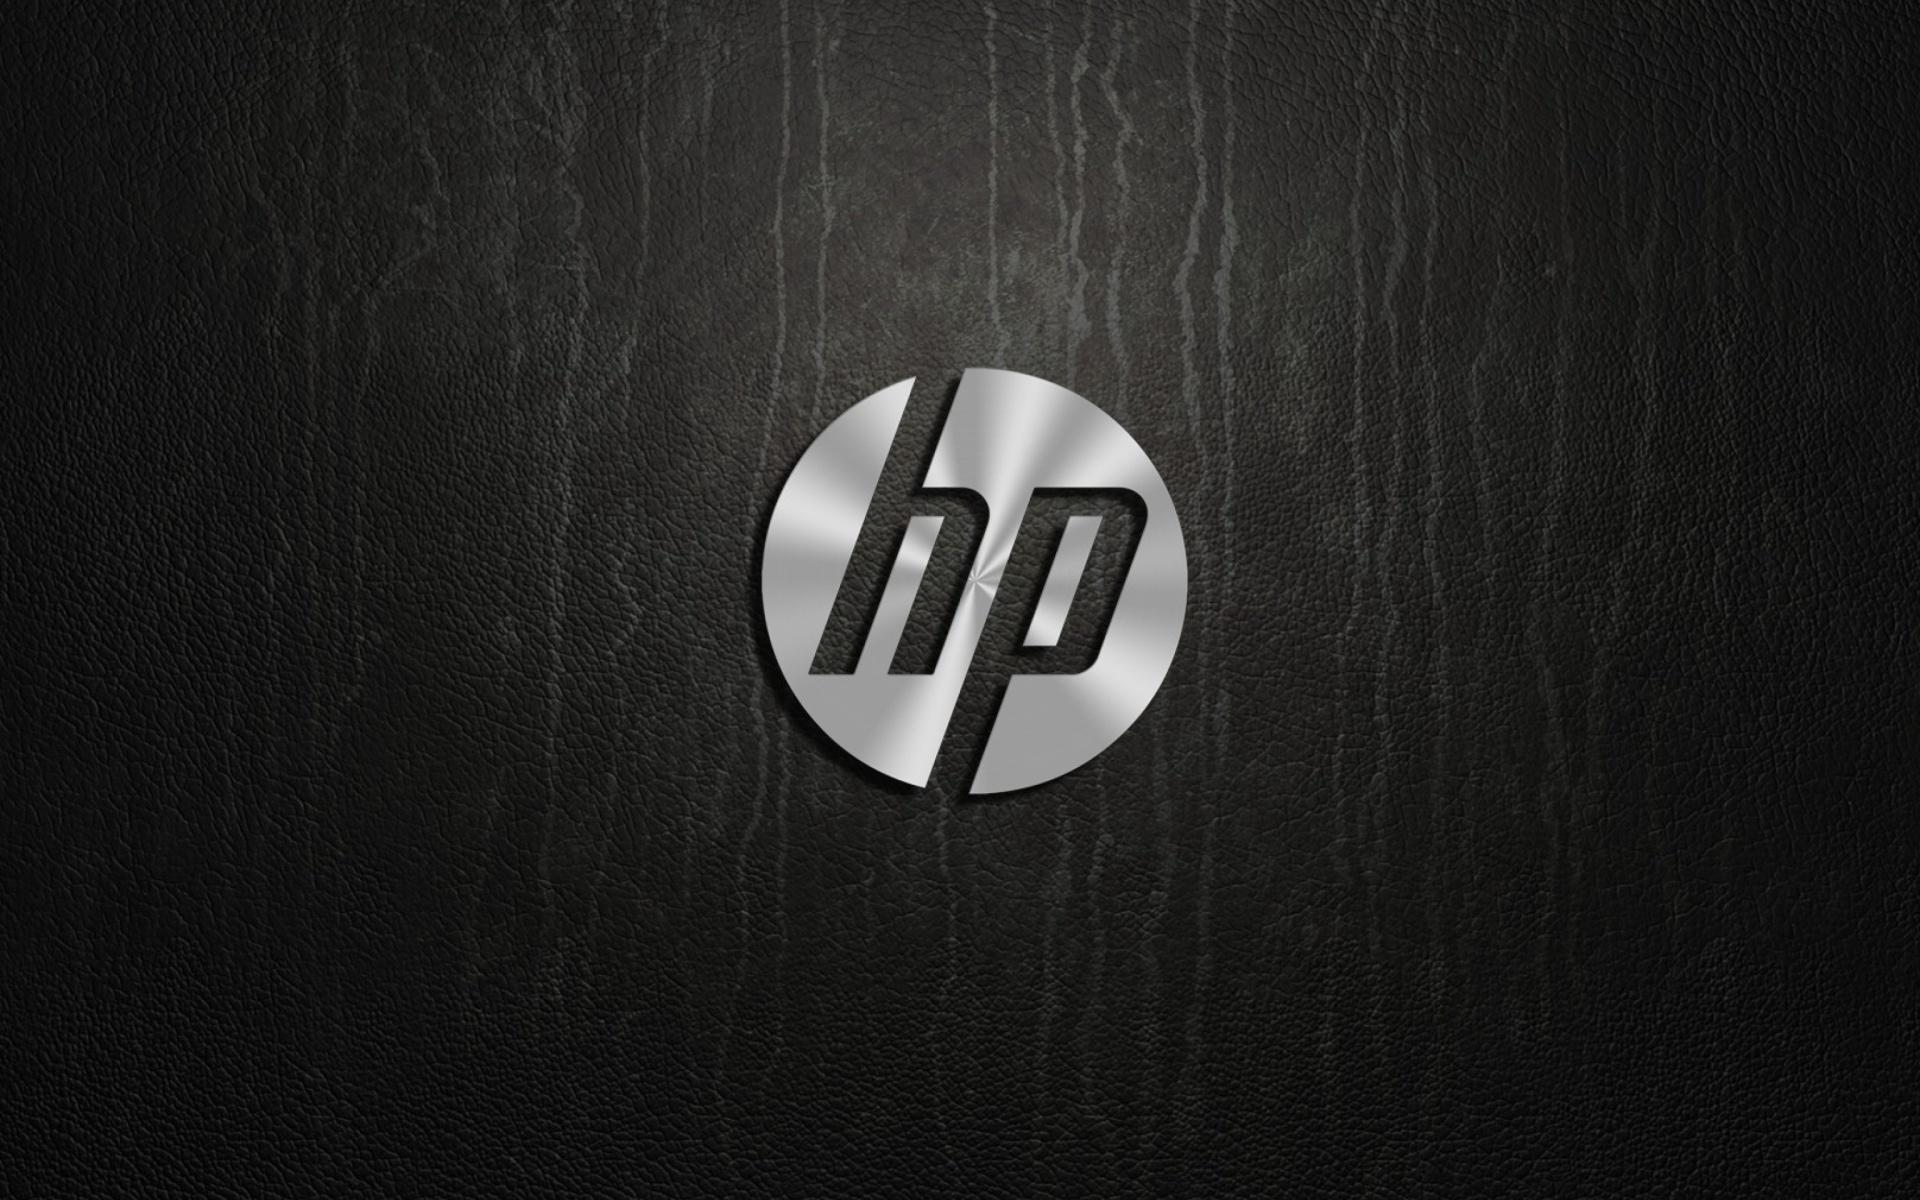 Download 52 Wallpaper Hp For Pc Gratis